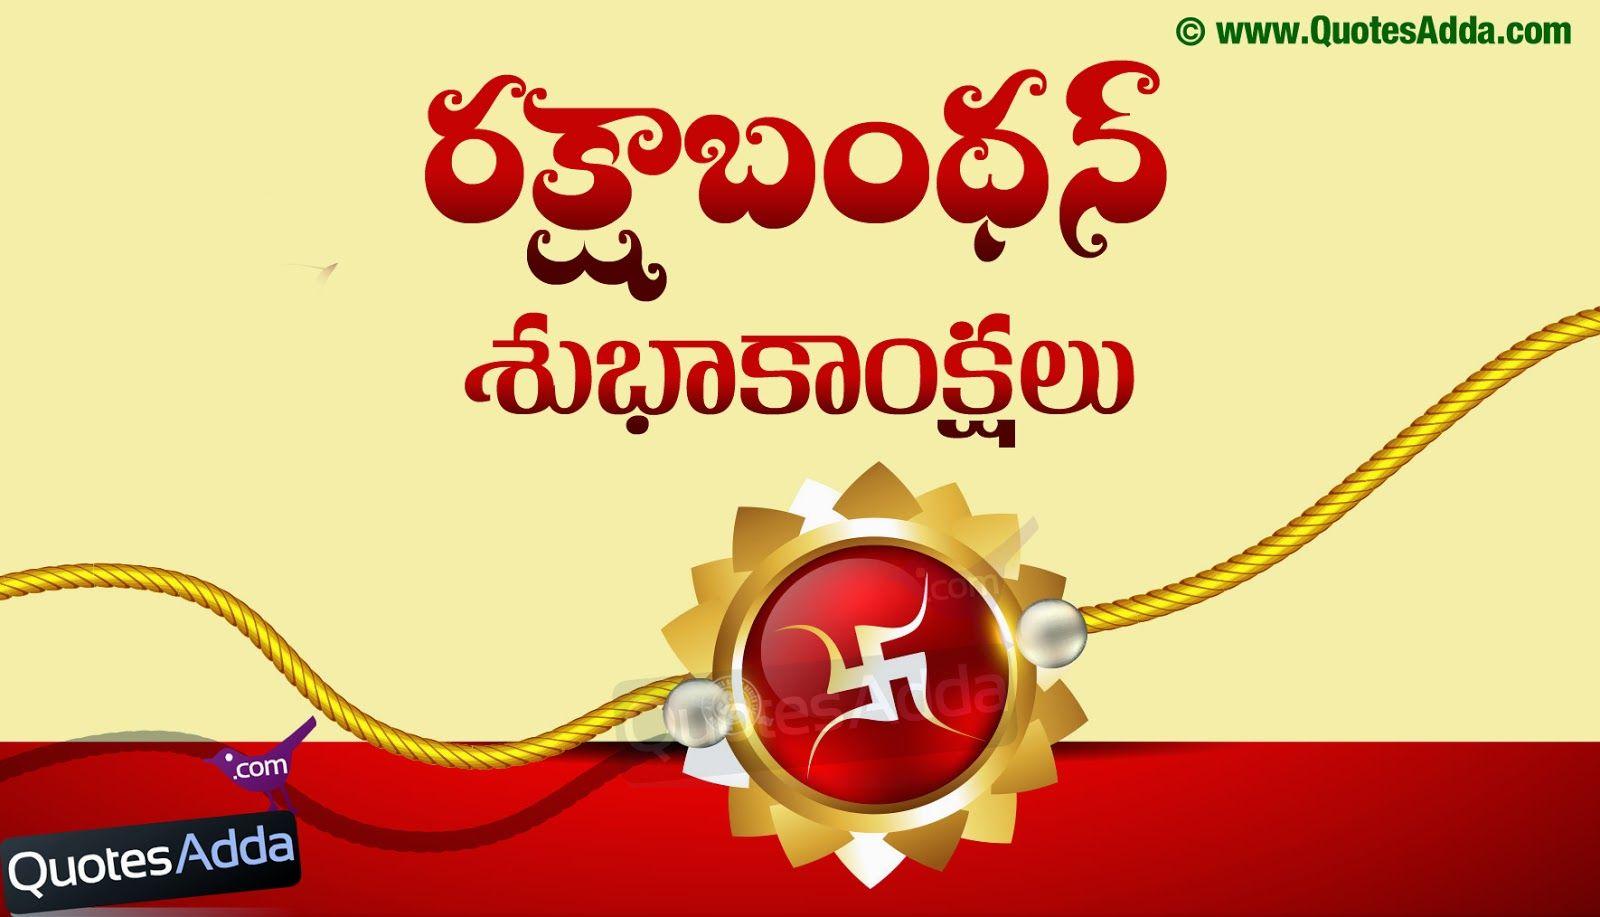 Happy Raksha Bandhan Telugu Quotations and Greetings line QuotesAdda Telugu Quotes